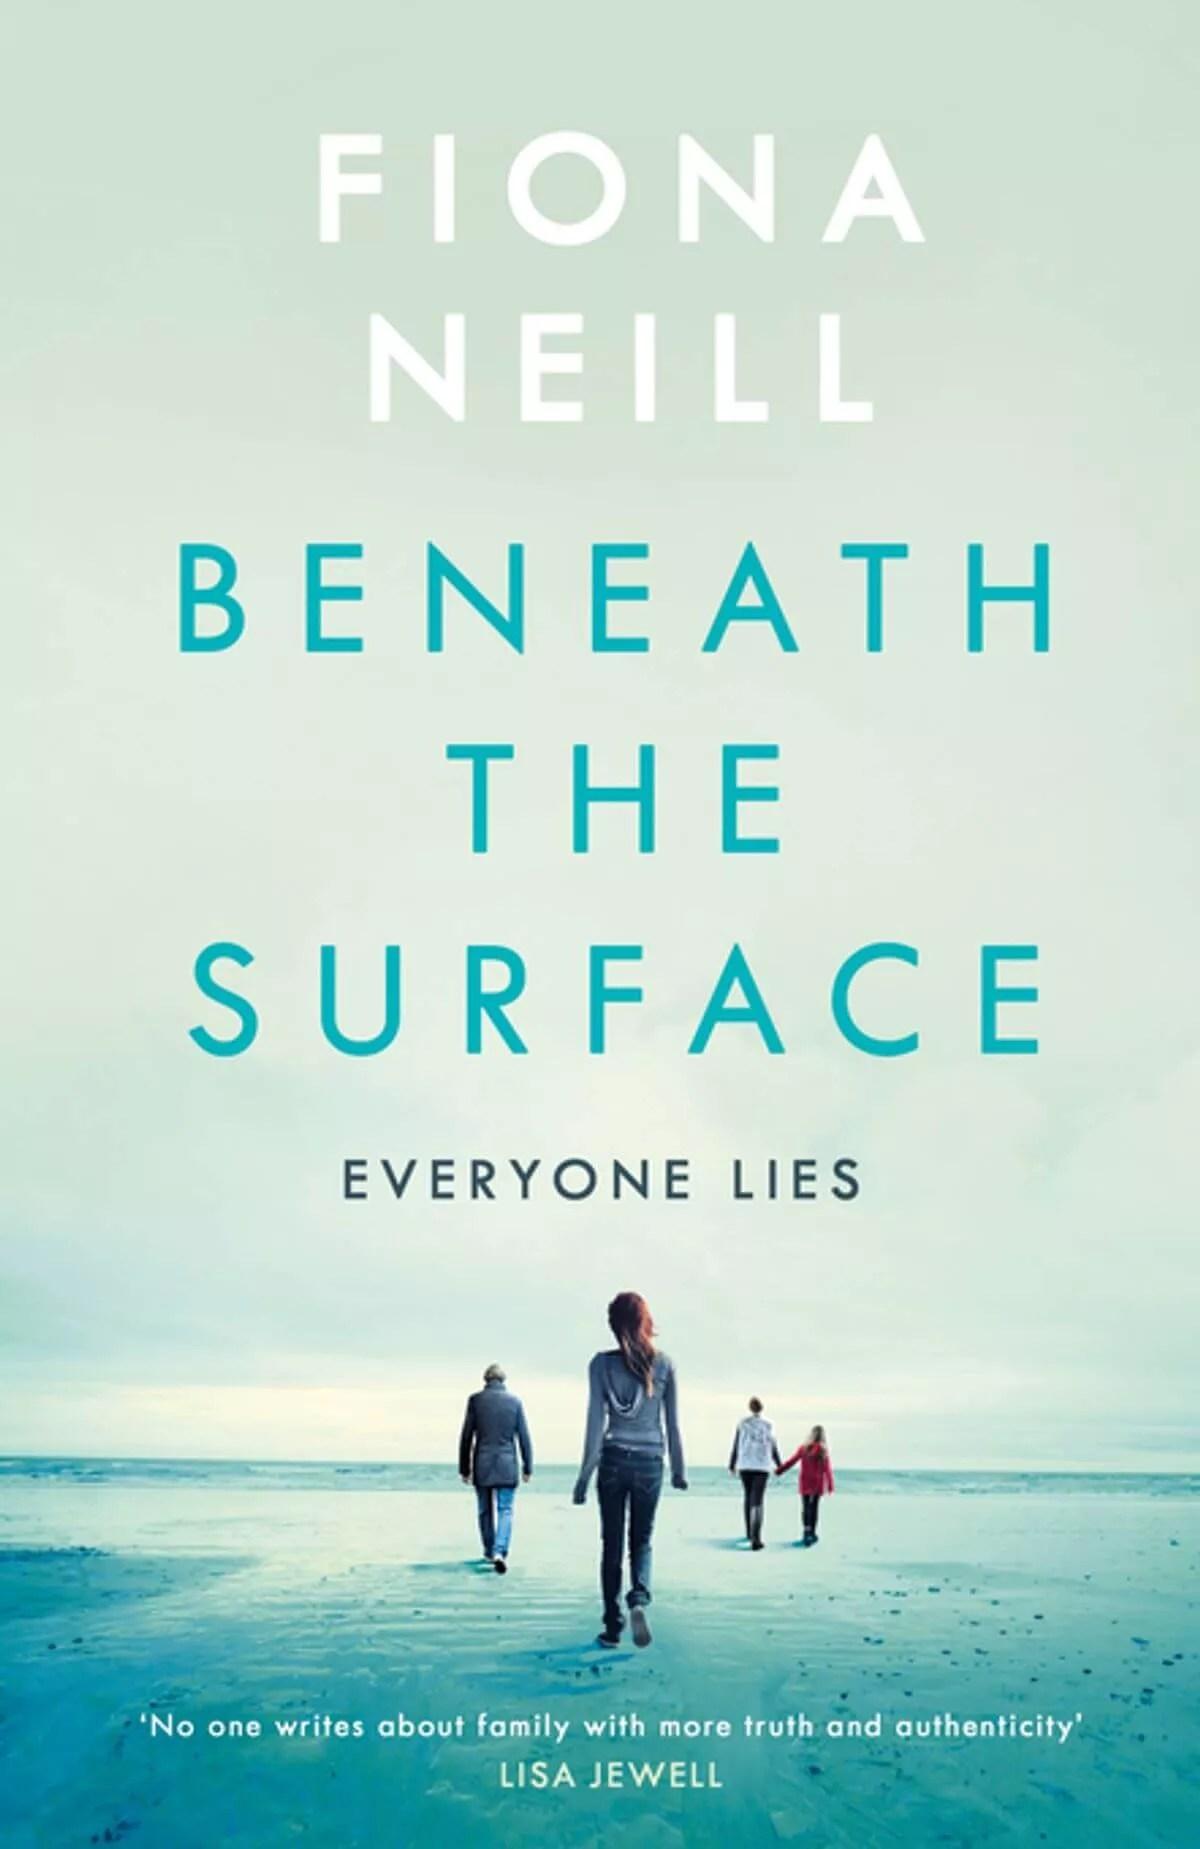 Beneath the surface Fiona Neill